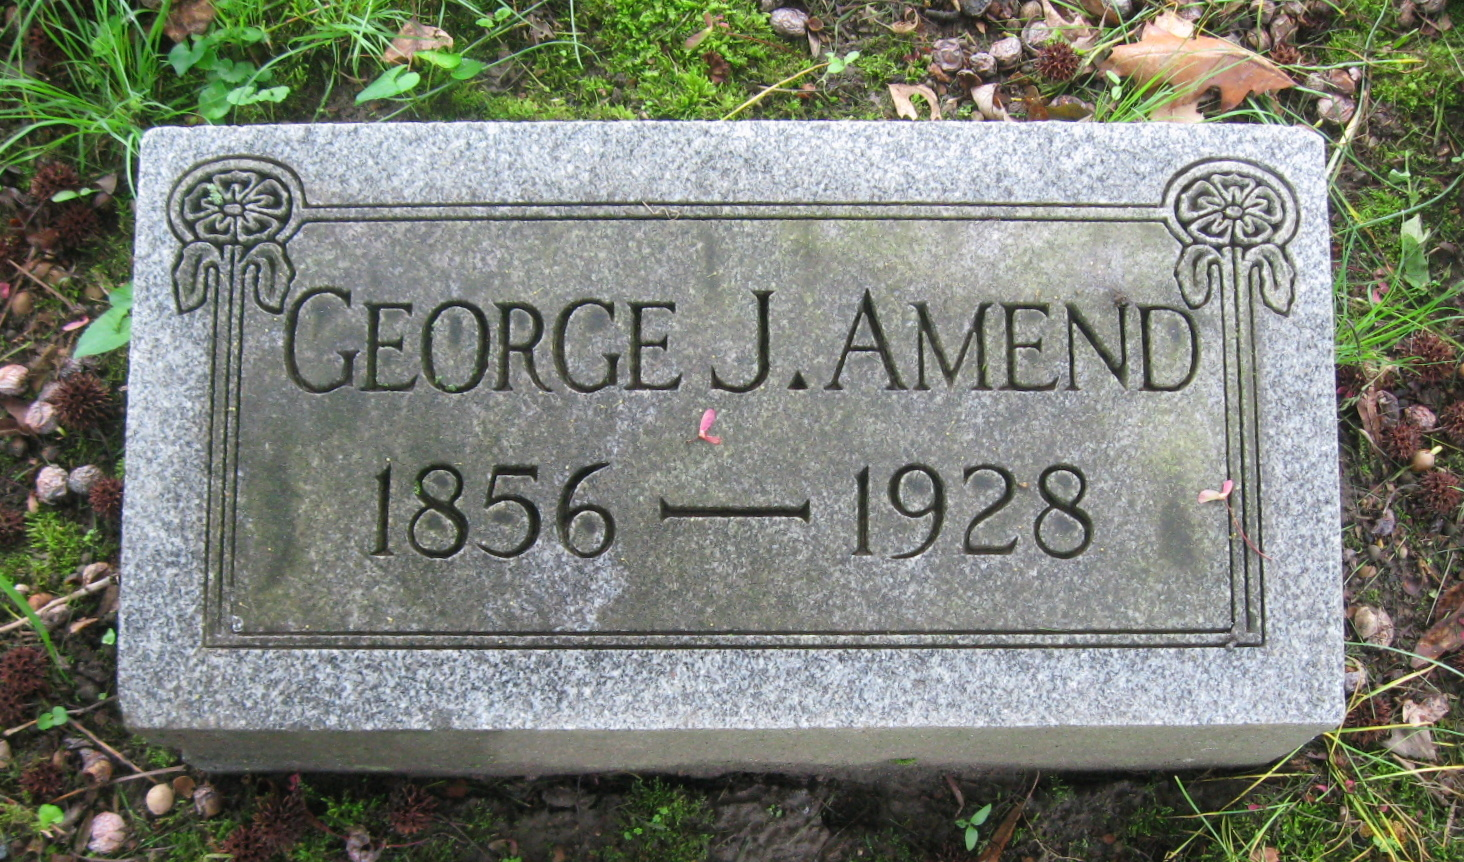 George John Amend